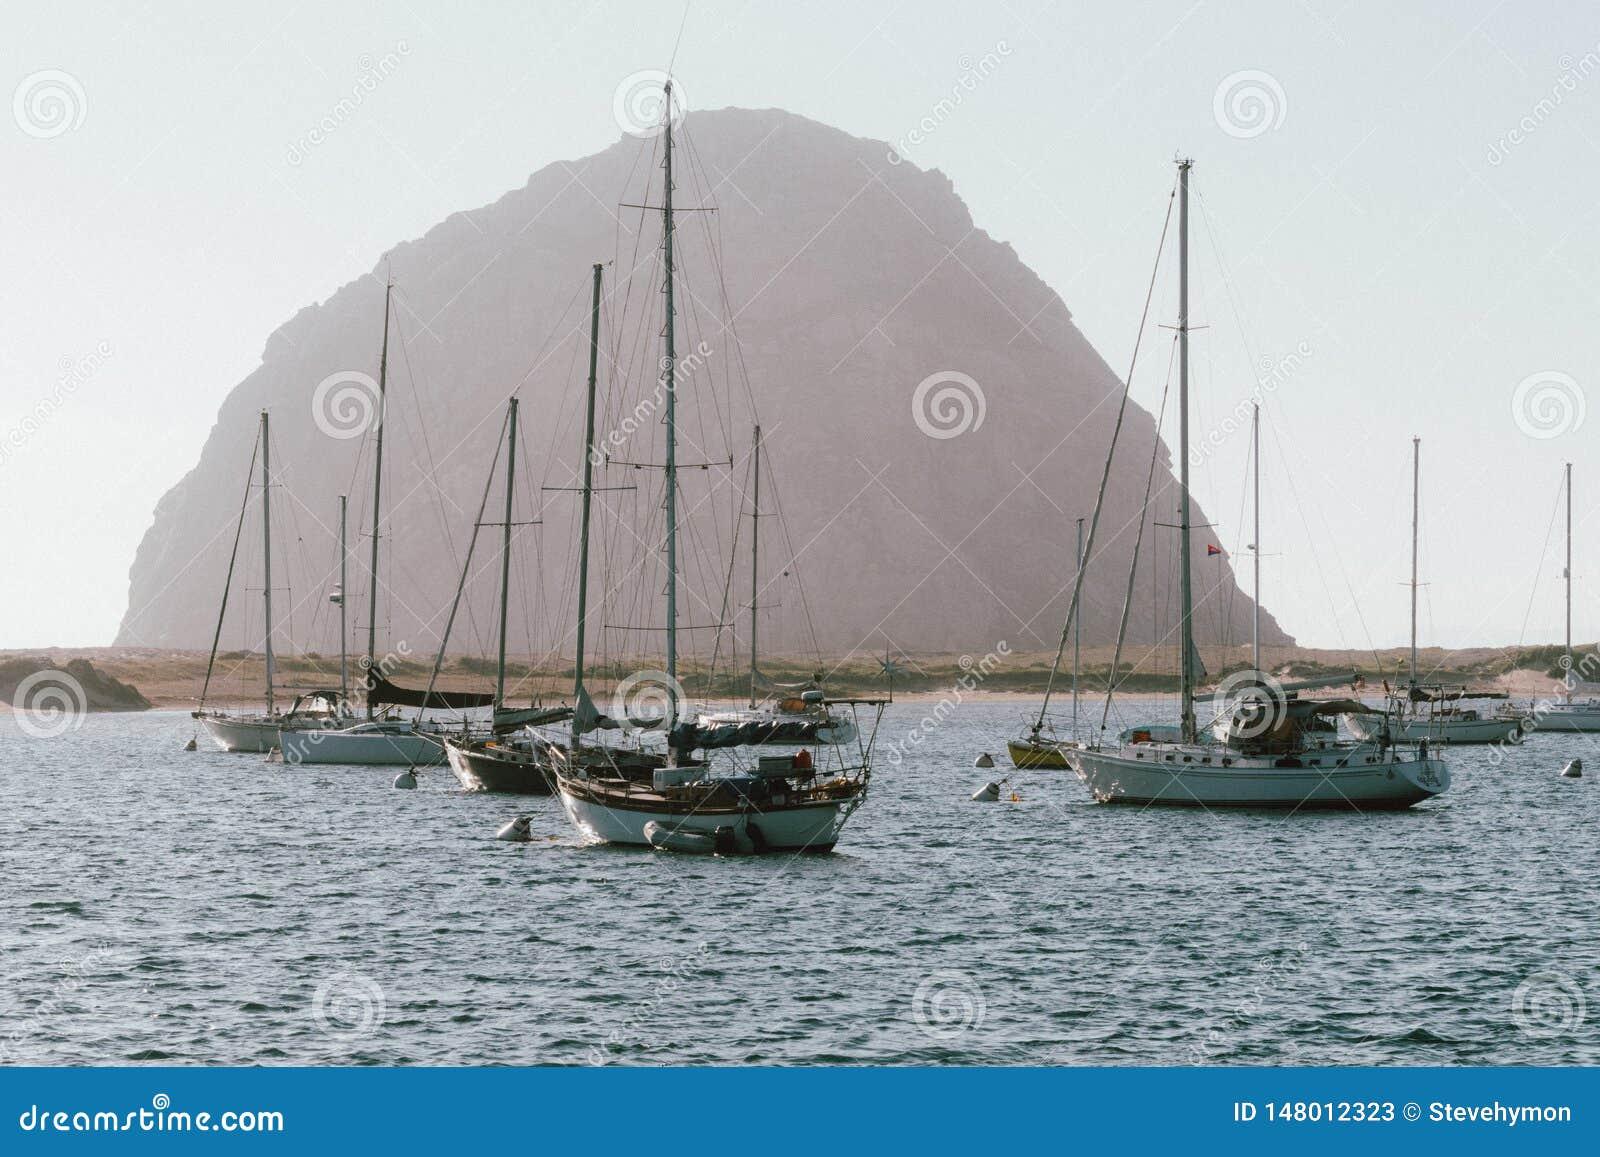 Morro Bay - California - SunCruiser